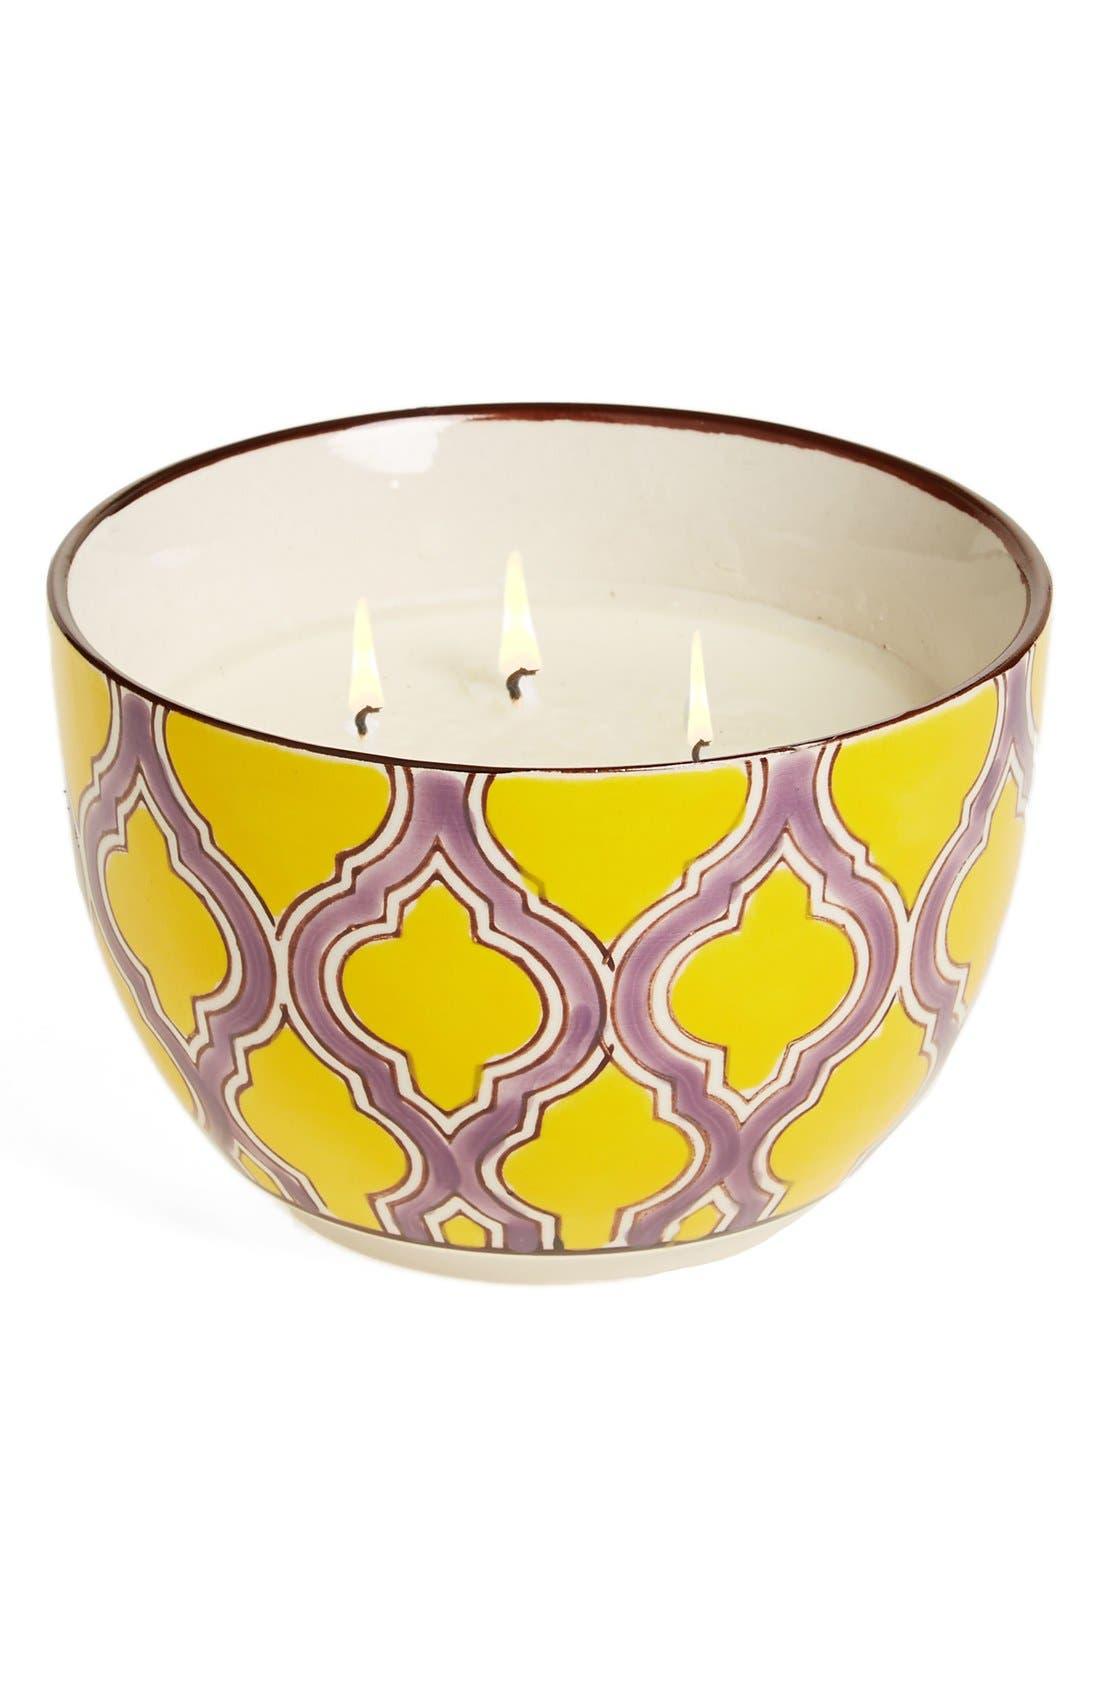 Main Image - Paddywax 'Bohème' Large Jar Candle